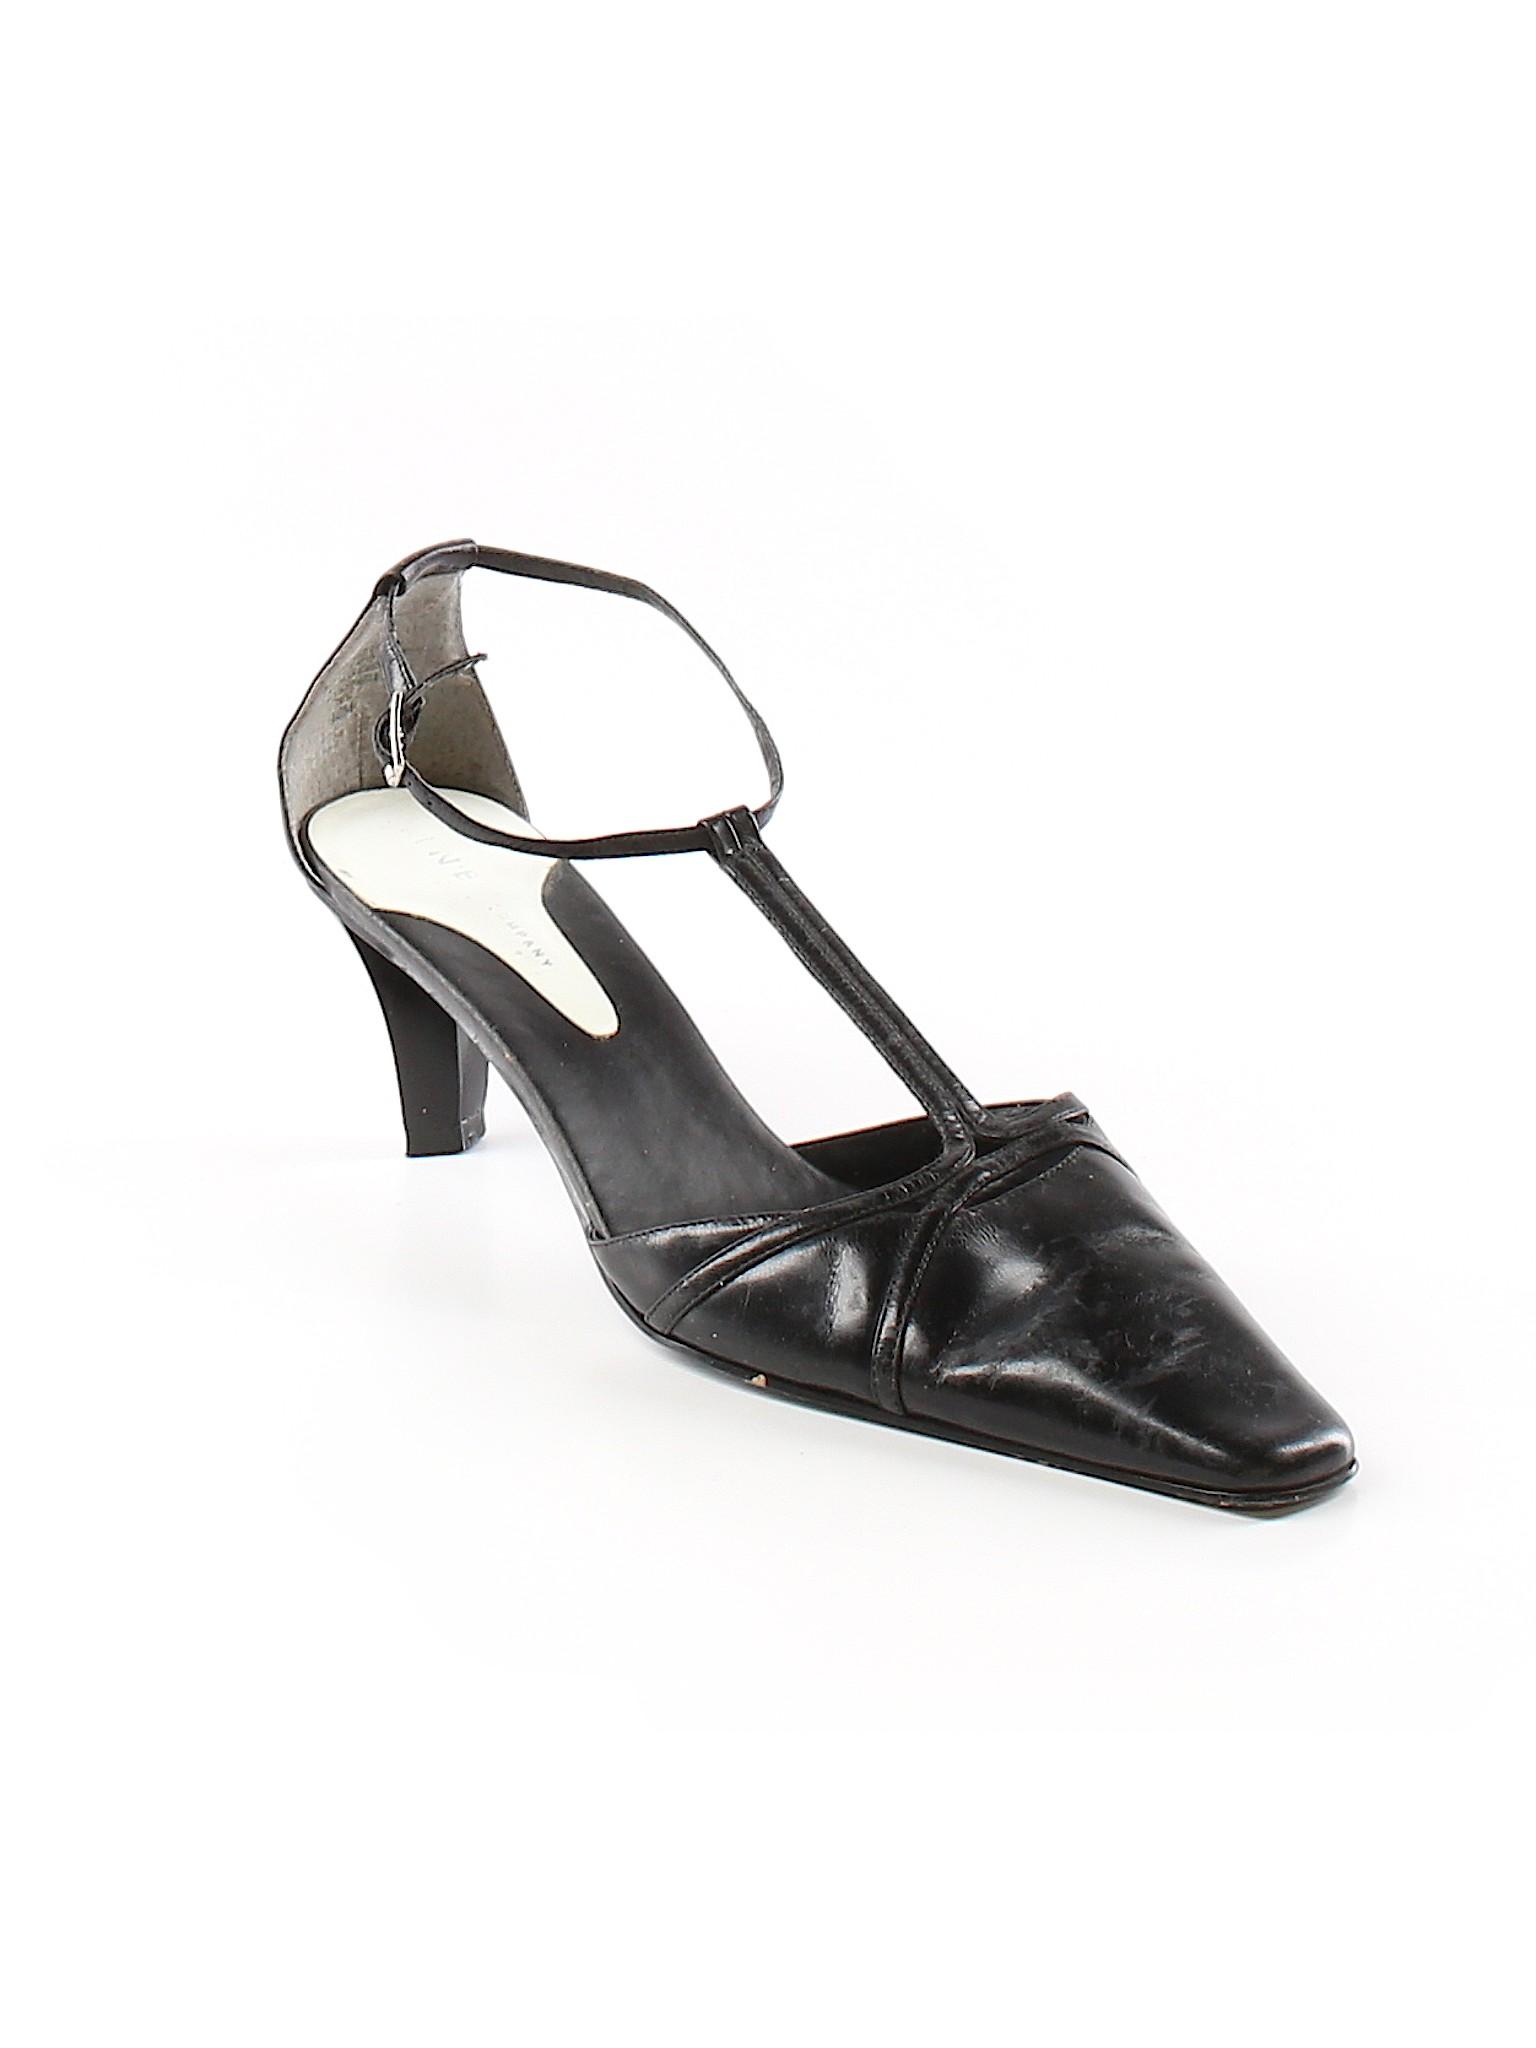 amp; Boutique promotion Company Nine Heels rnzfPrw4